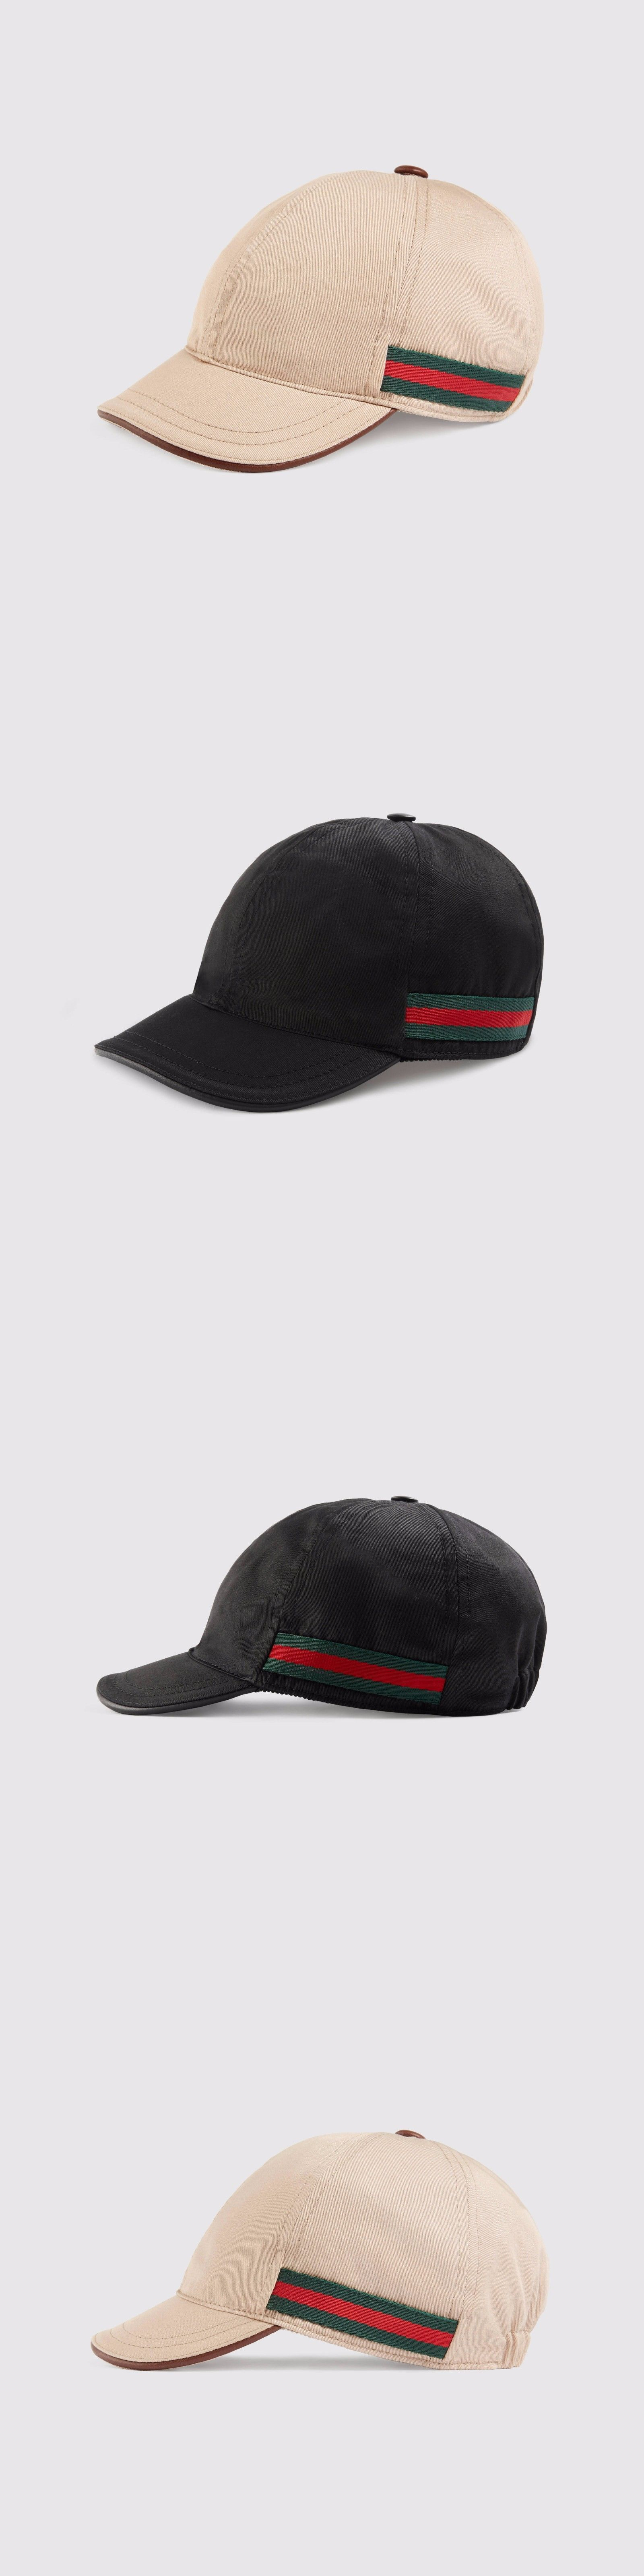 bafa4b05505db Hats 57884  Nwt New Gucci Kids Boys Girls Baseball Cap Hat Beige Black M L  311168 Last One -  BUY IT NOW ONLY   149 on eBay!